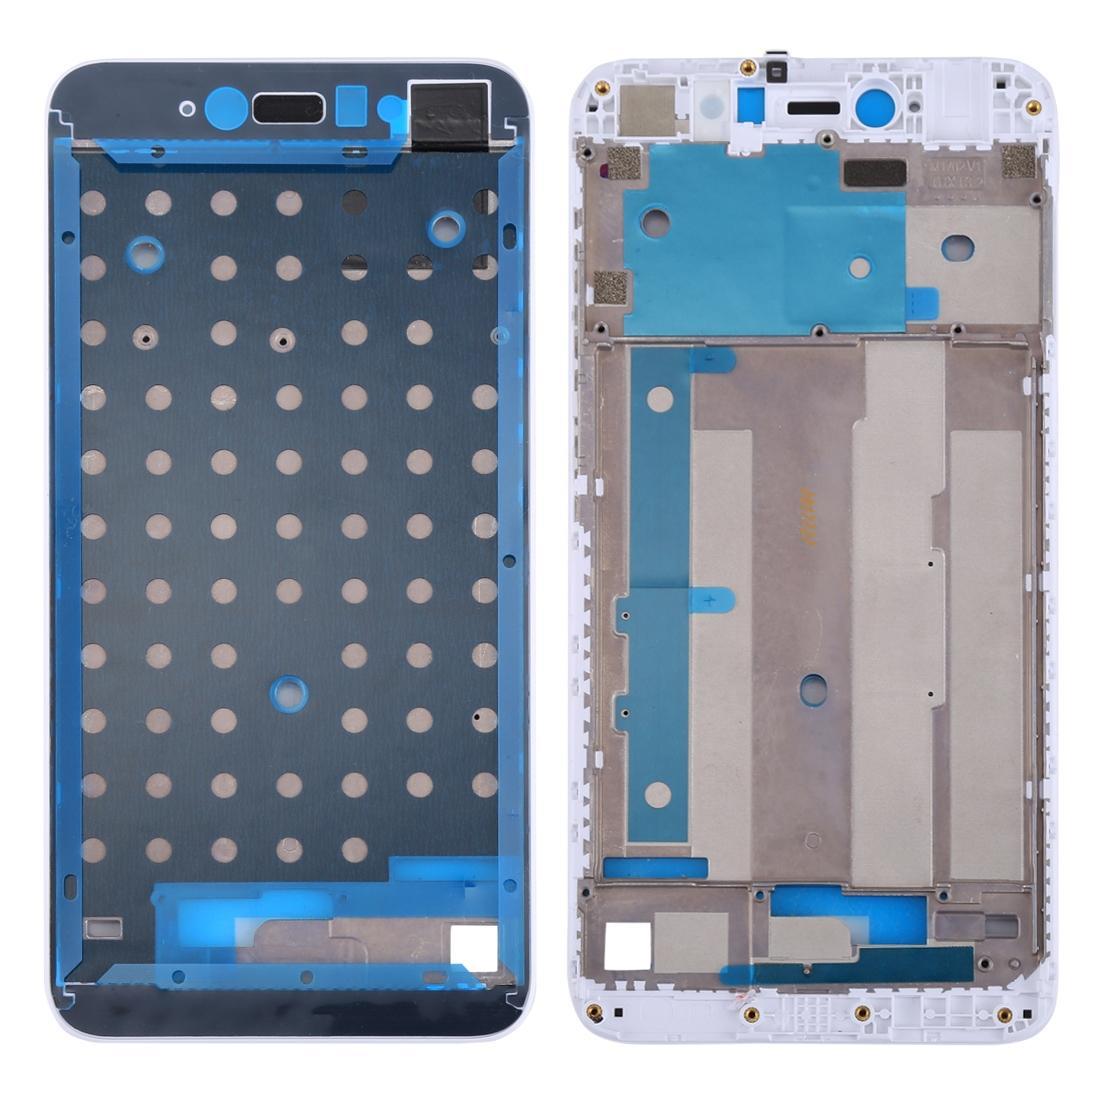 Hunian Depan Bingkai Bezel LCD untuk Xiaomi Redmi Note 5A/Y1 Lite (Putih)